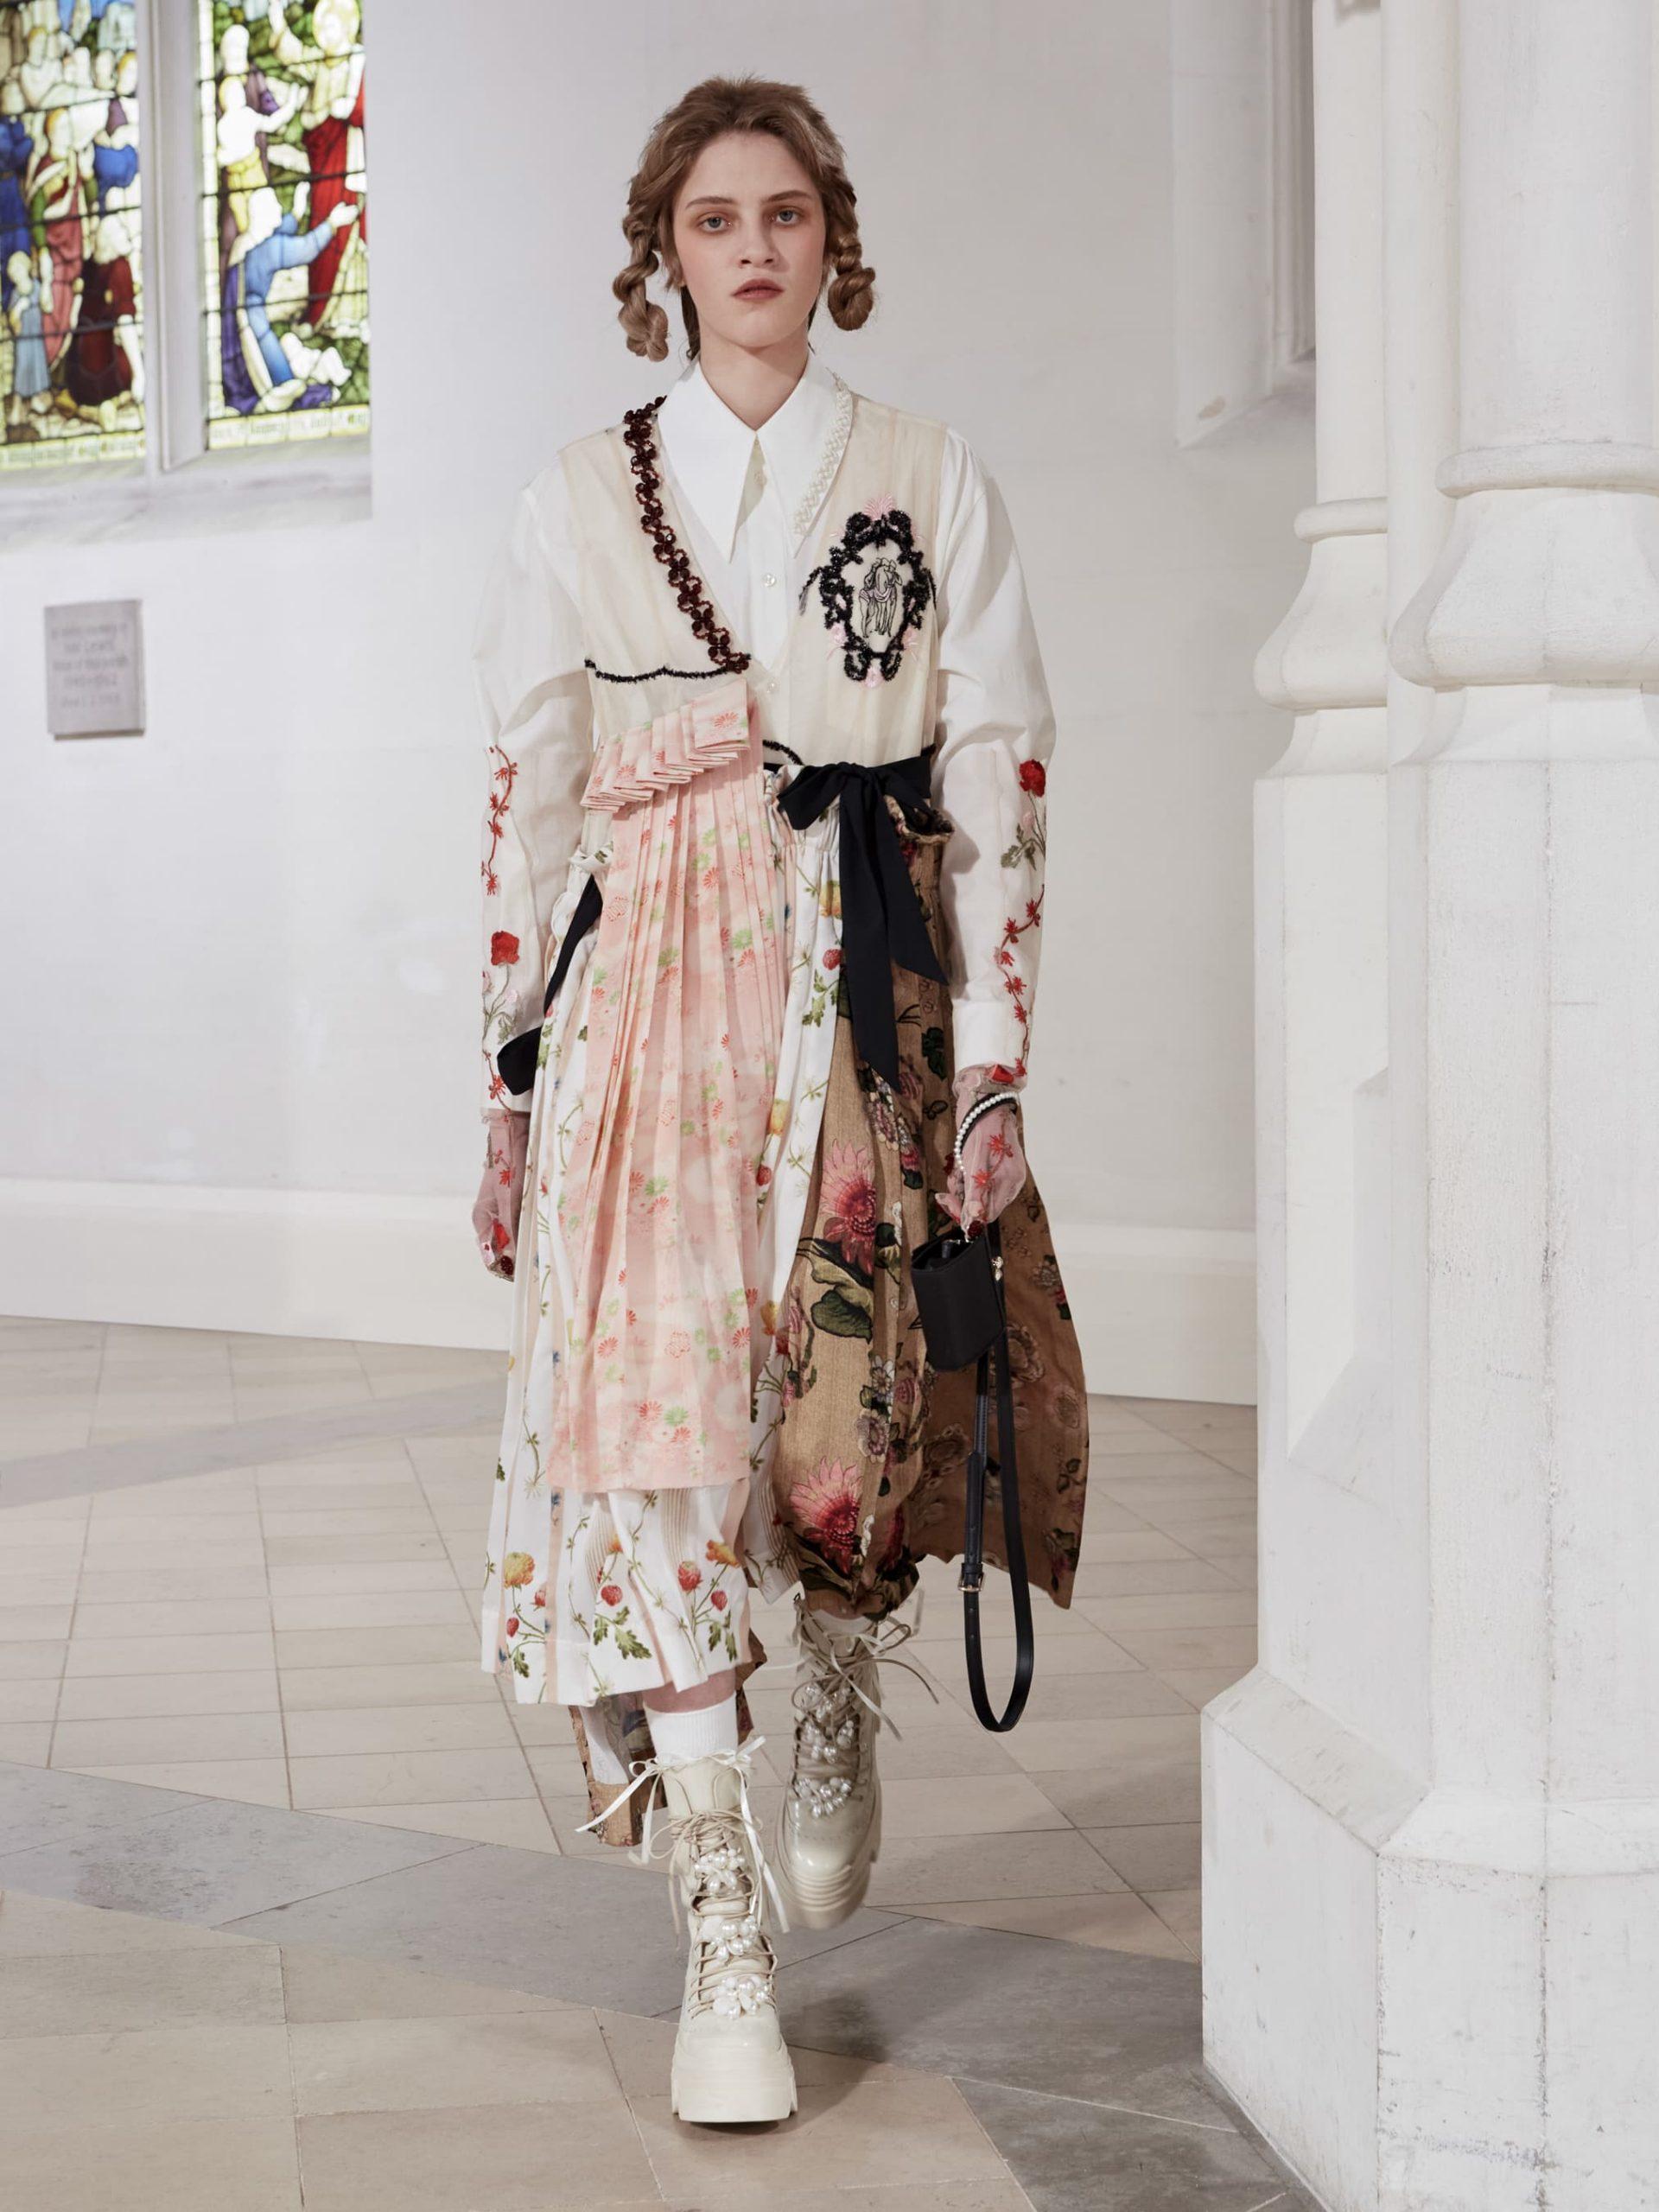 London Fall 2021 Fashion Show Reviews